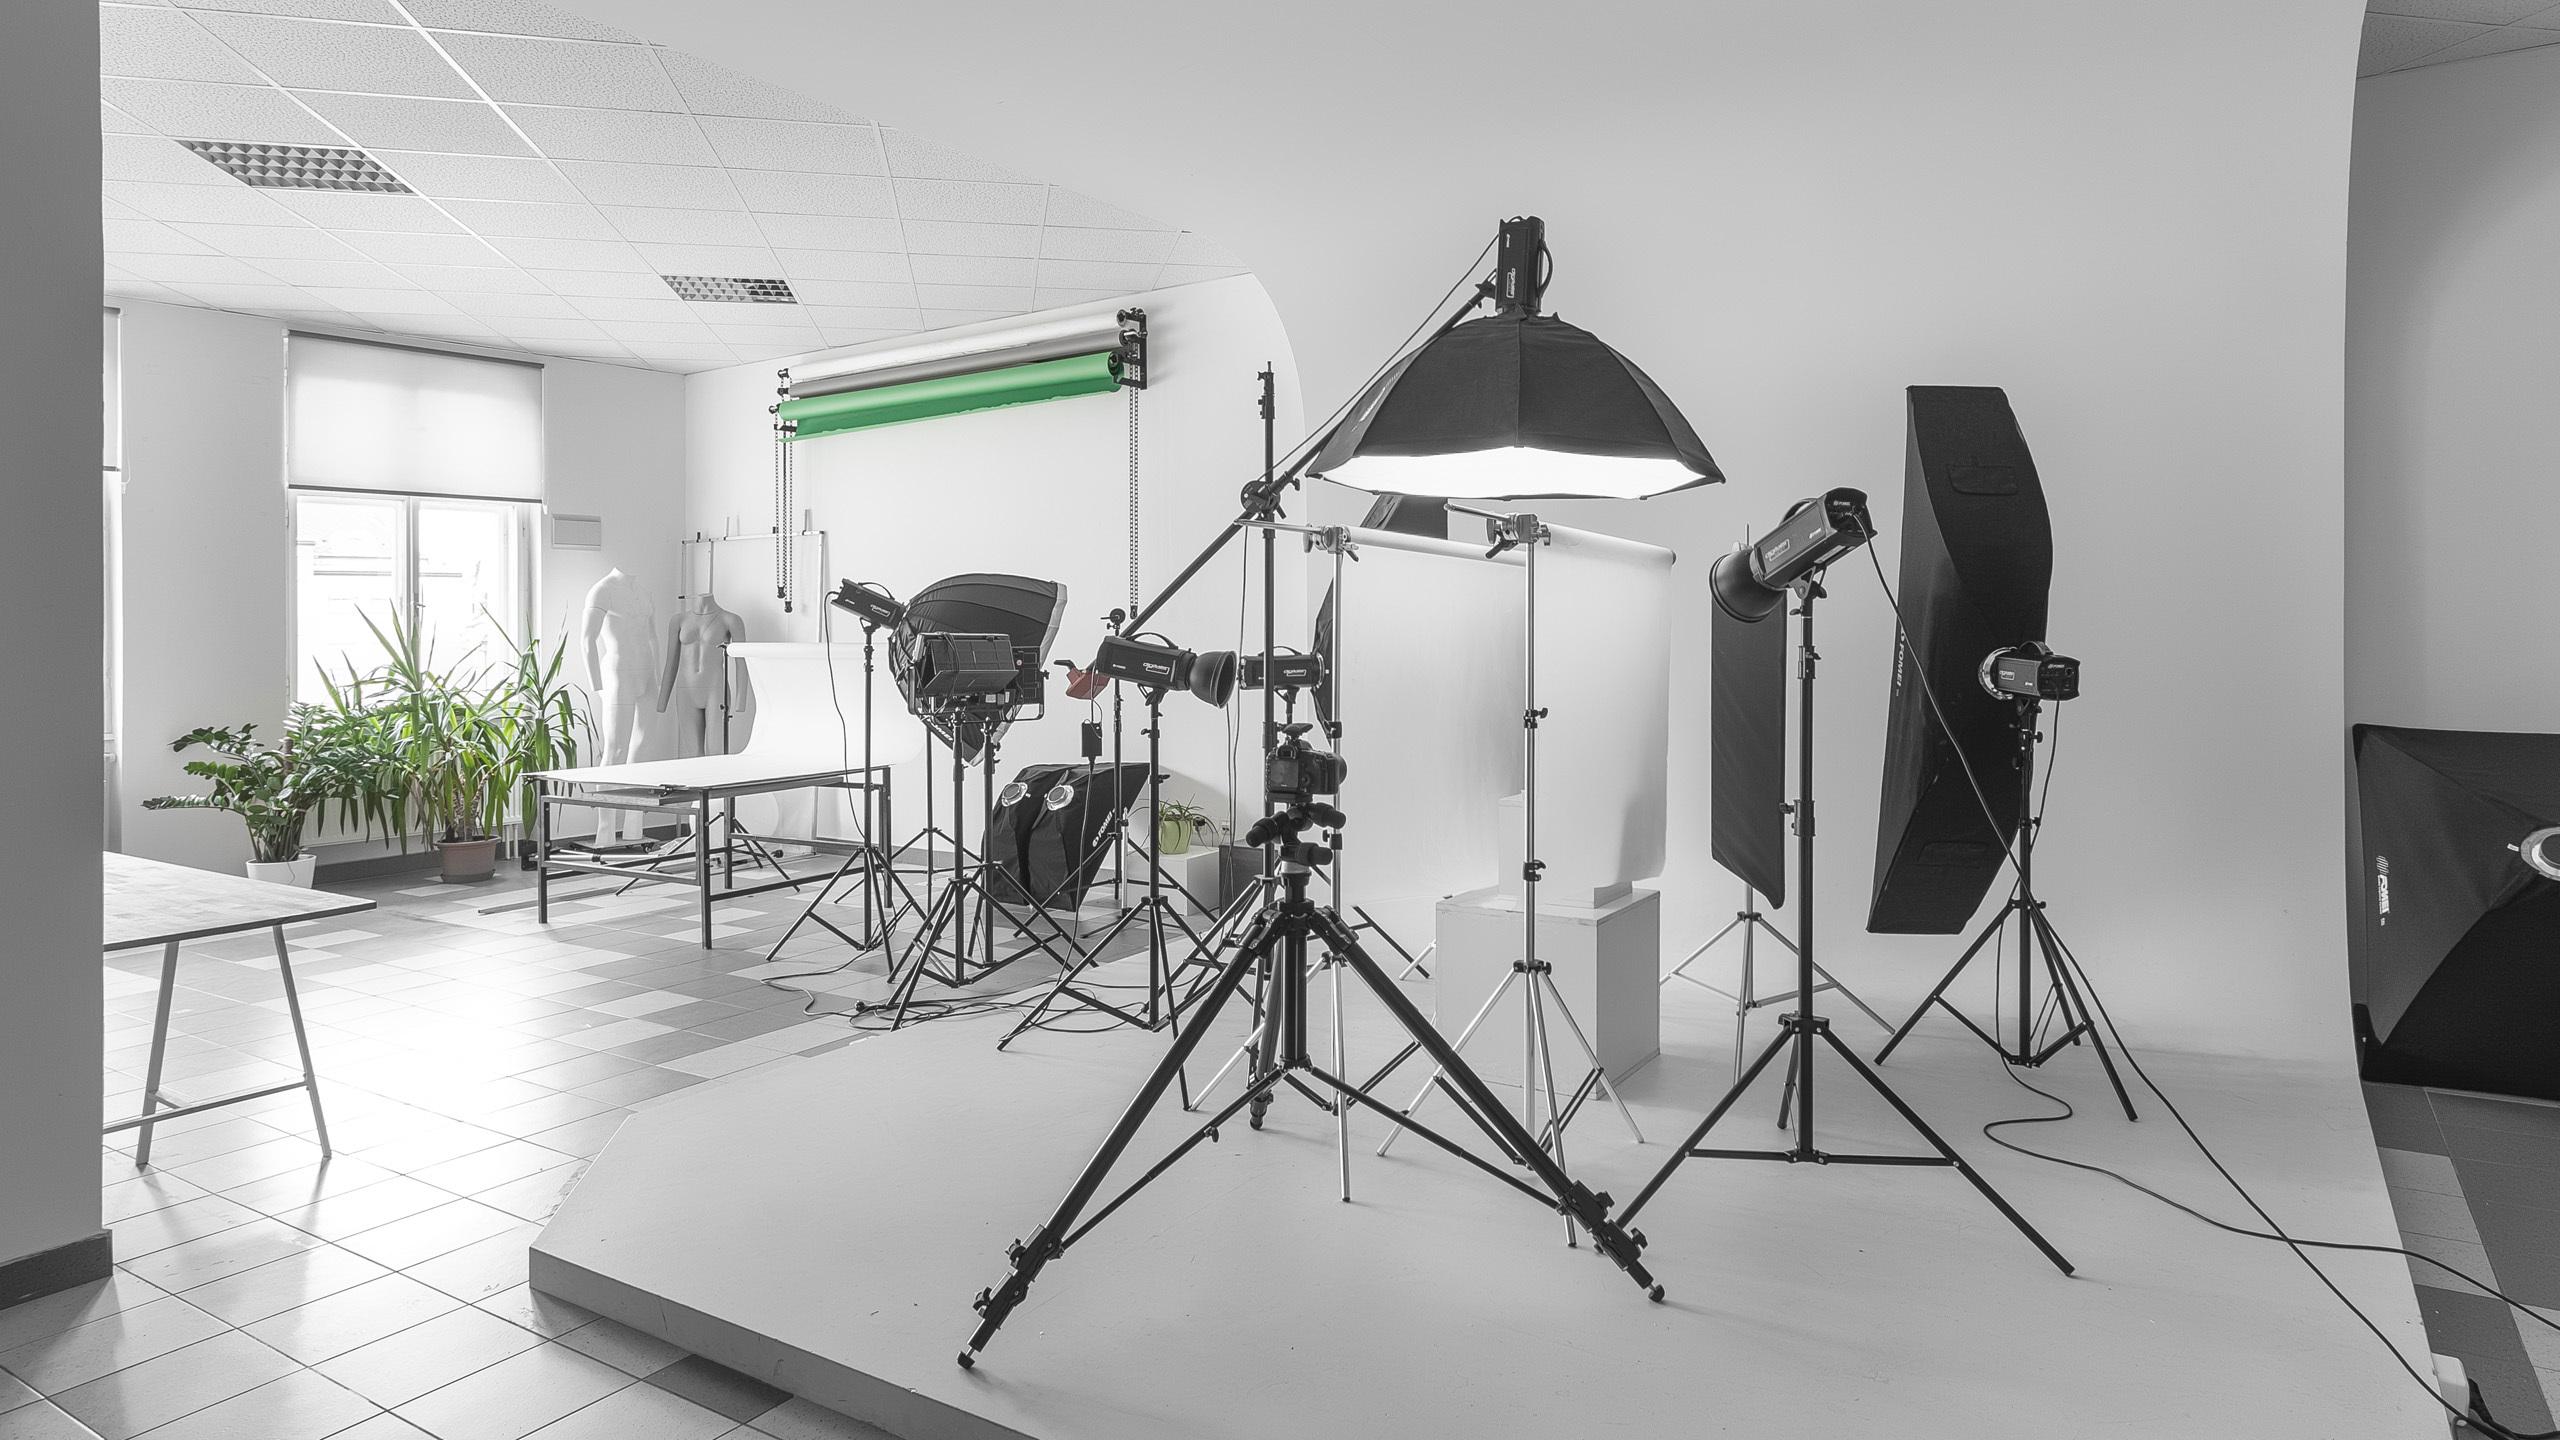 Brostudio - product photography studio setup